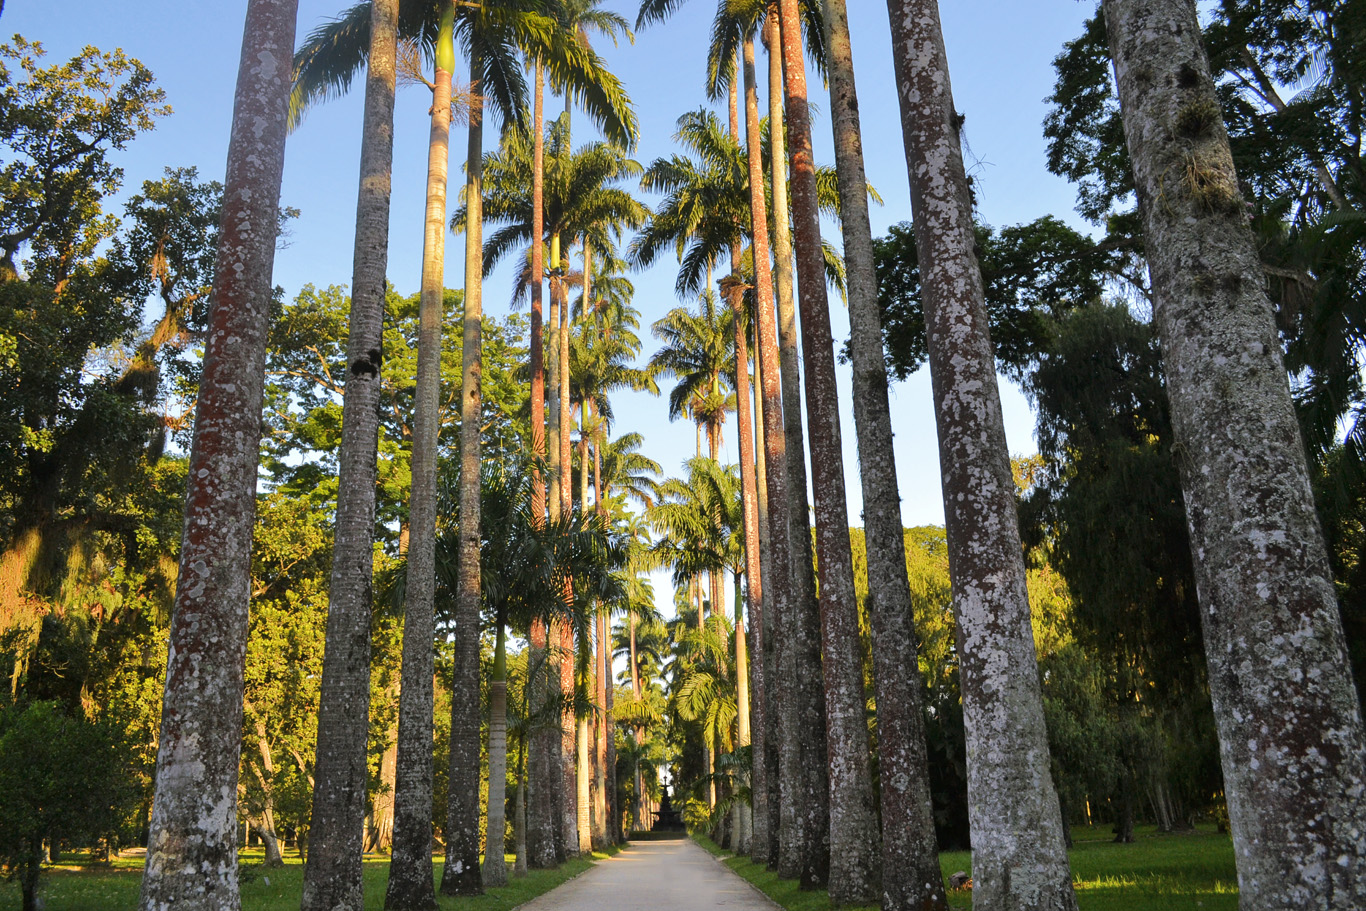 Botanic gardens - the avenue of royal palms